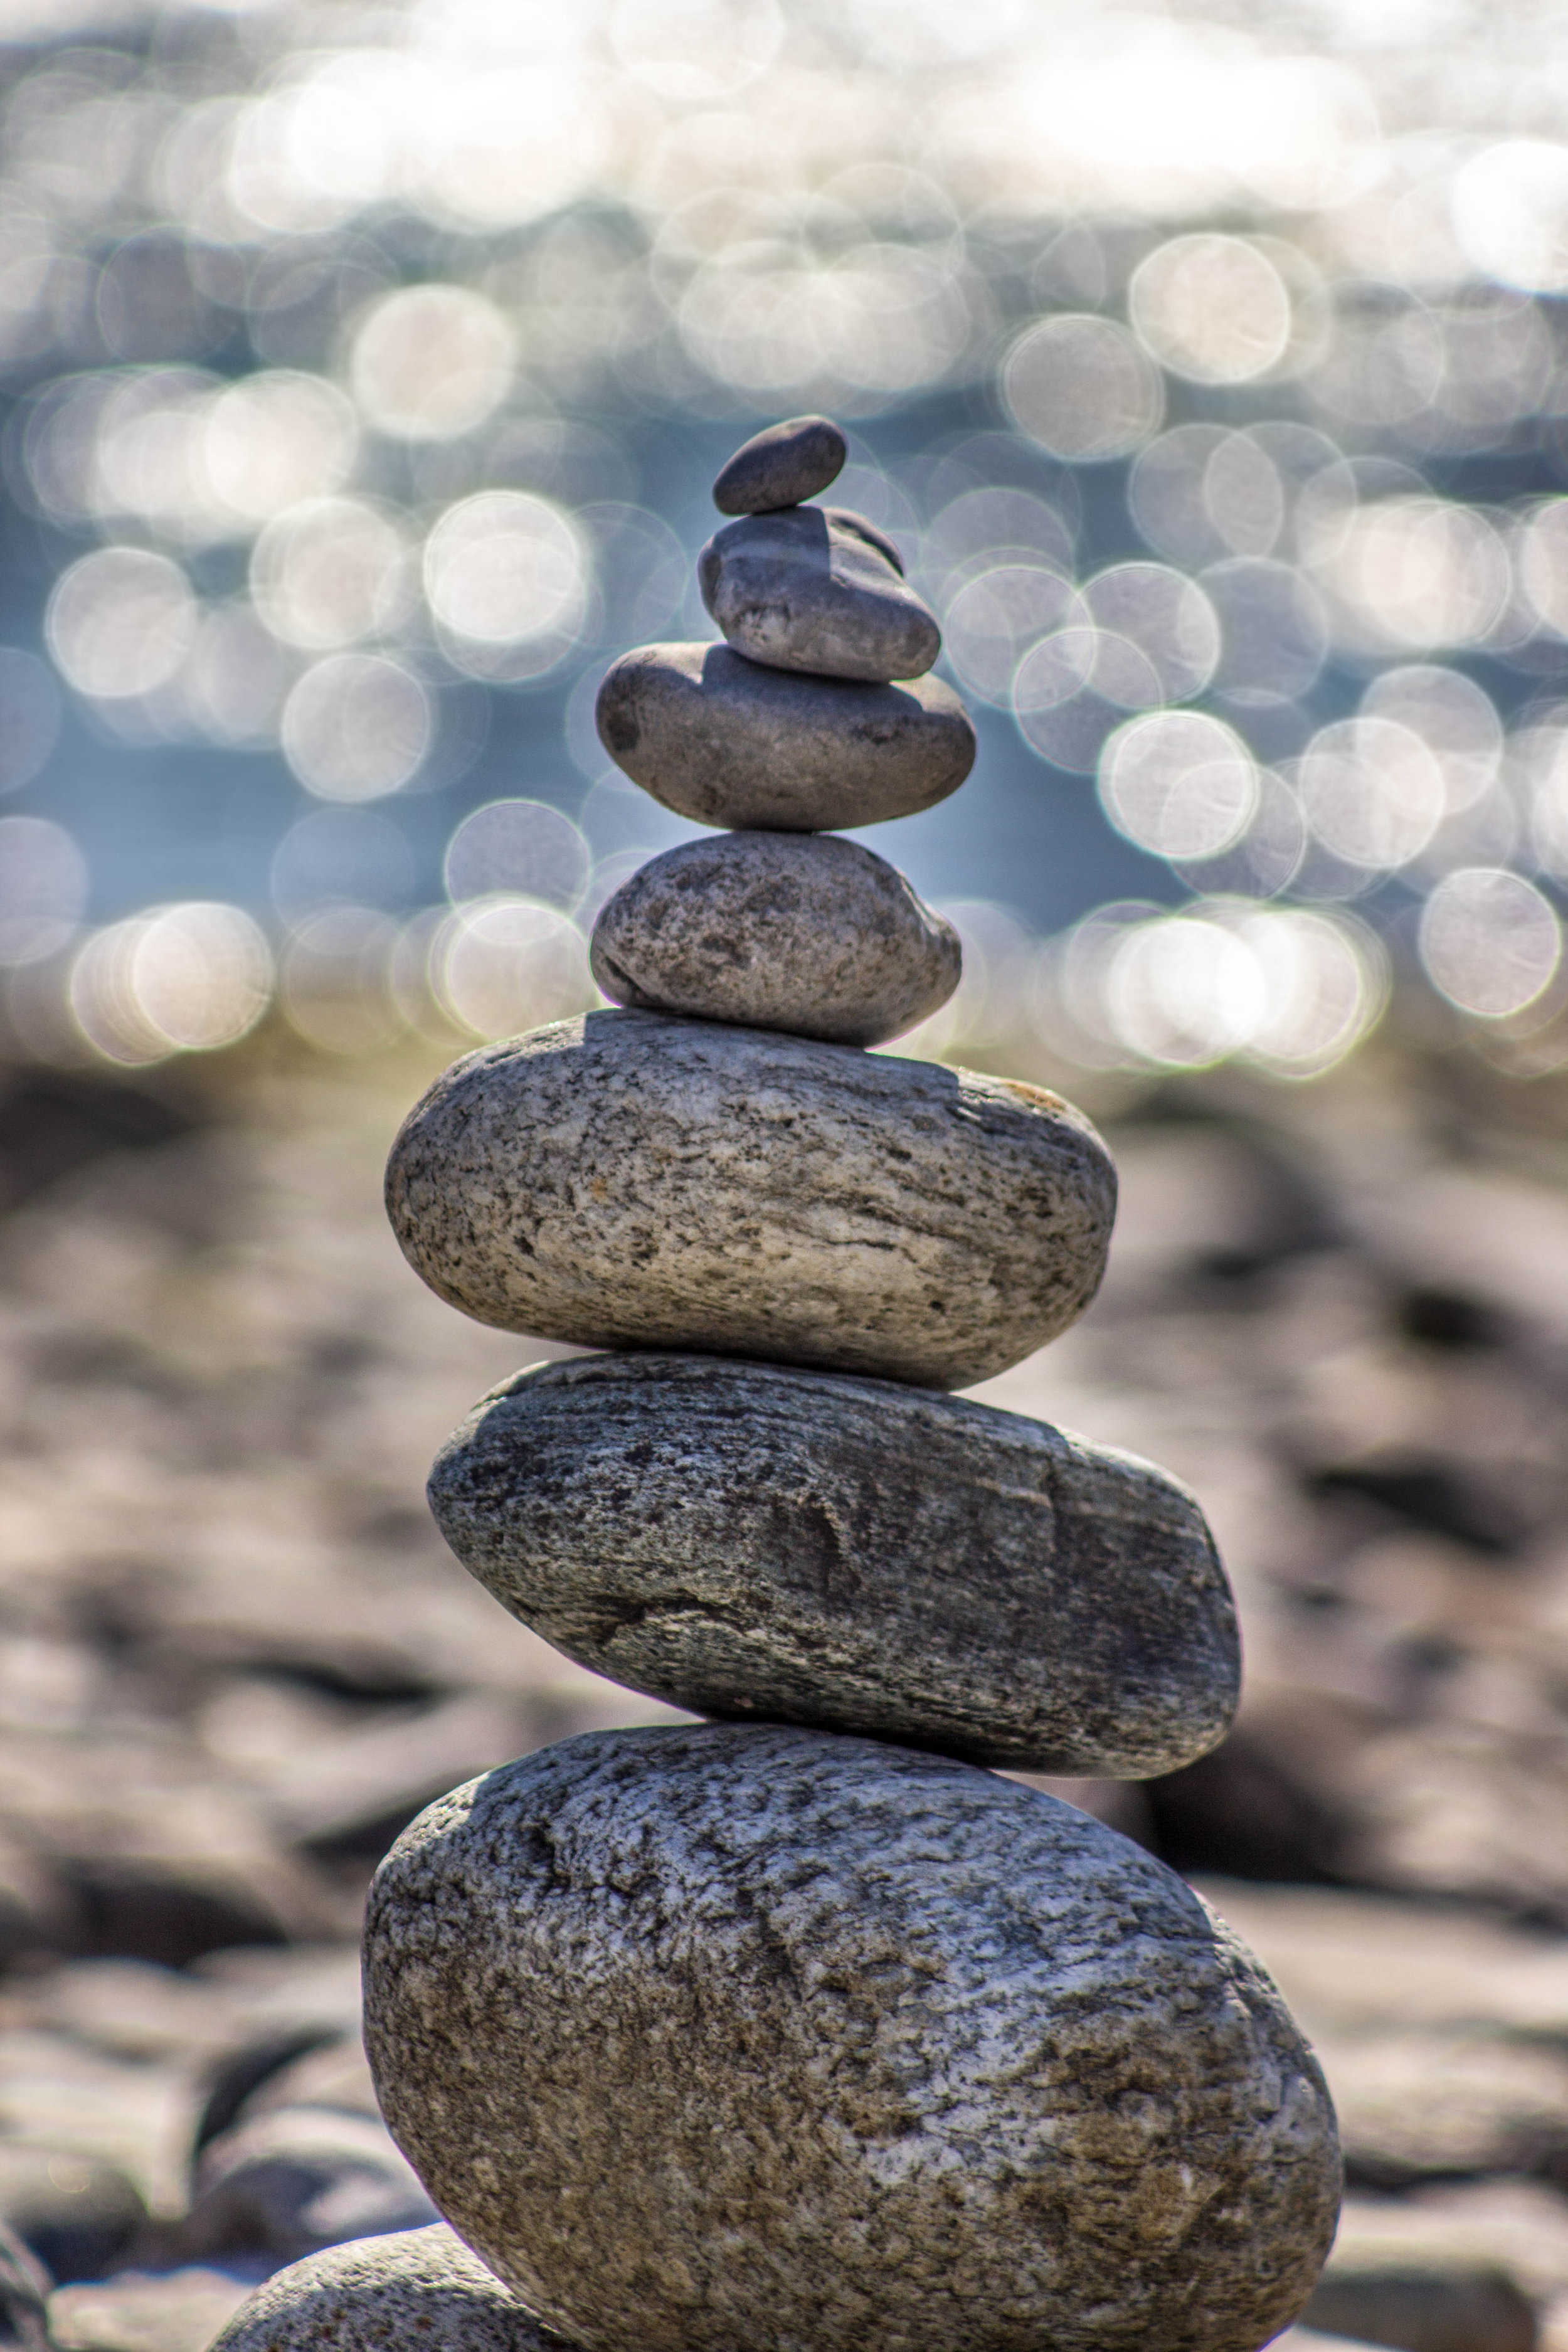 Balanced rocks with a peaceful bokeh backdrop